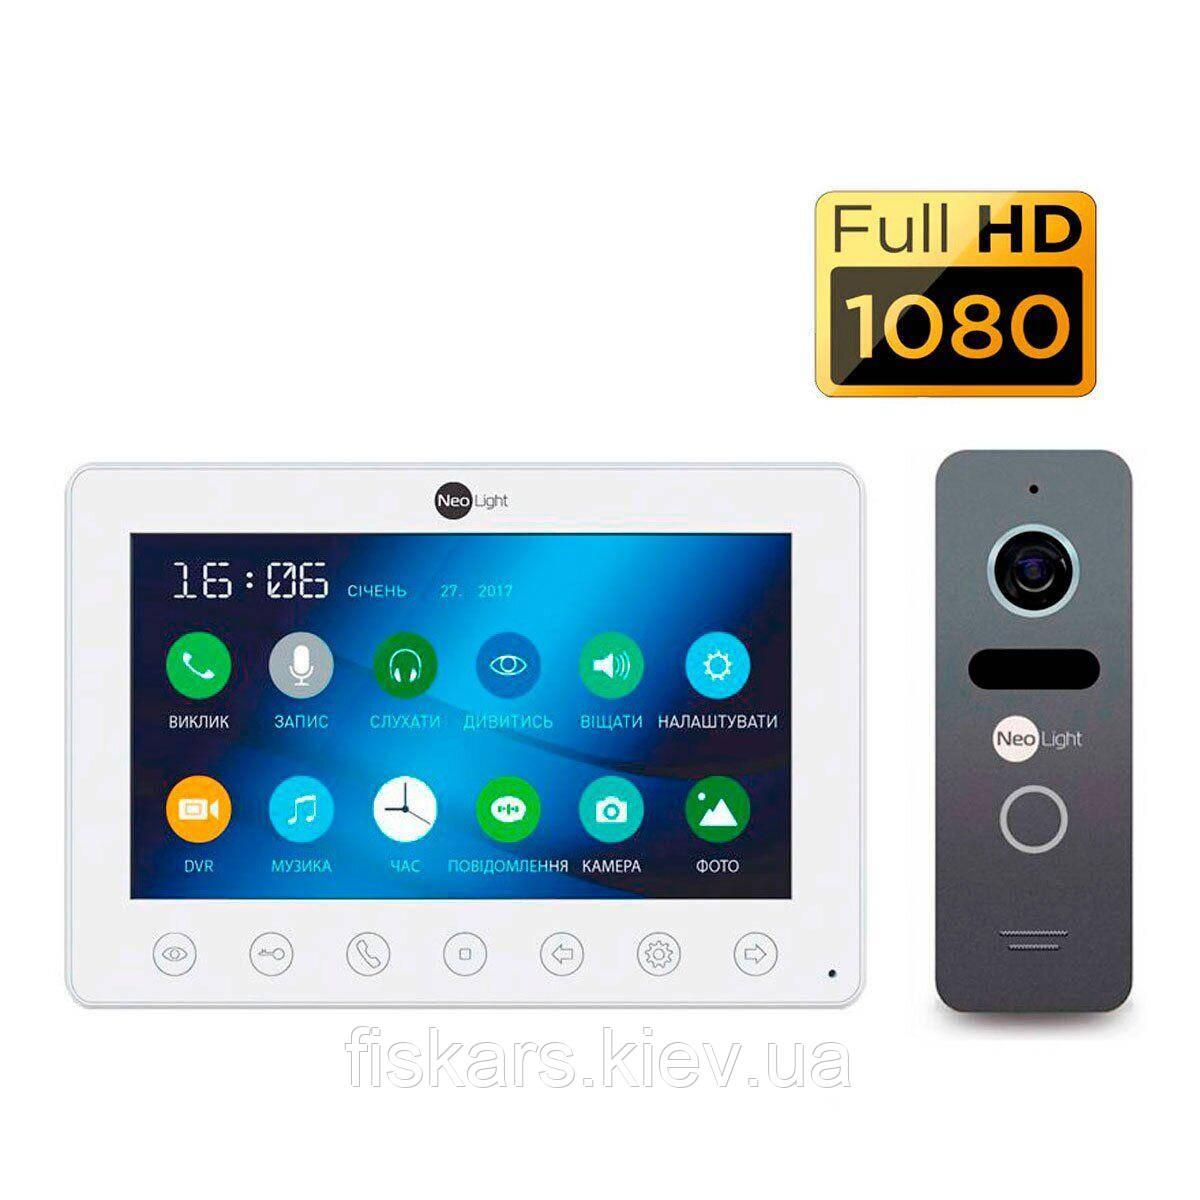 Комплект видеодомофона NeoLight Omega+HD Solo FHD